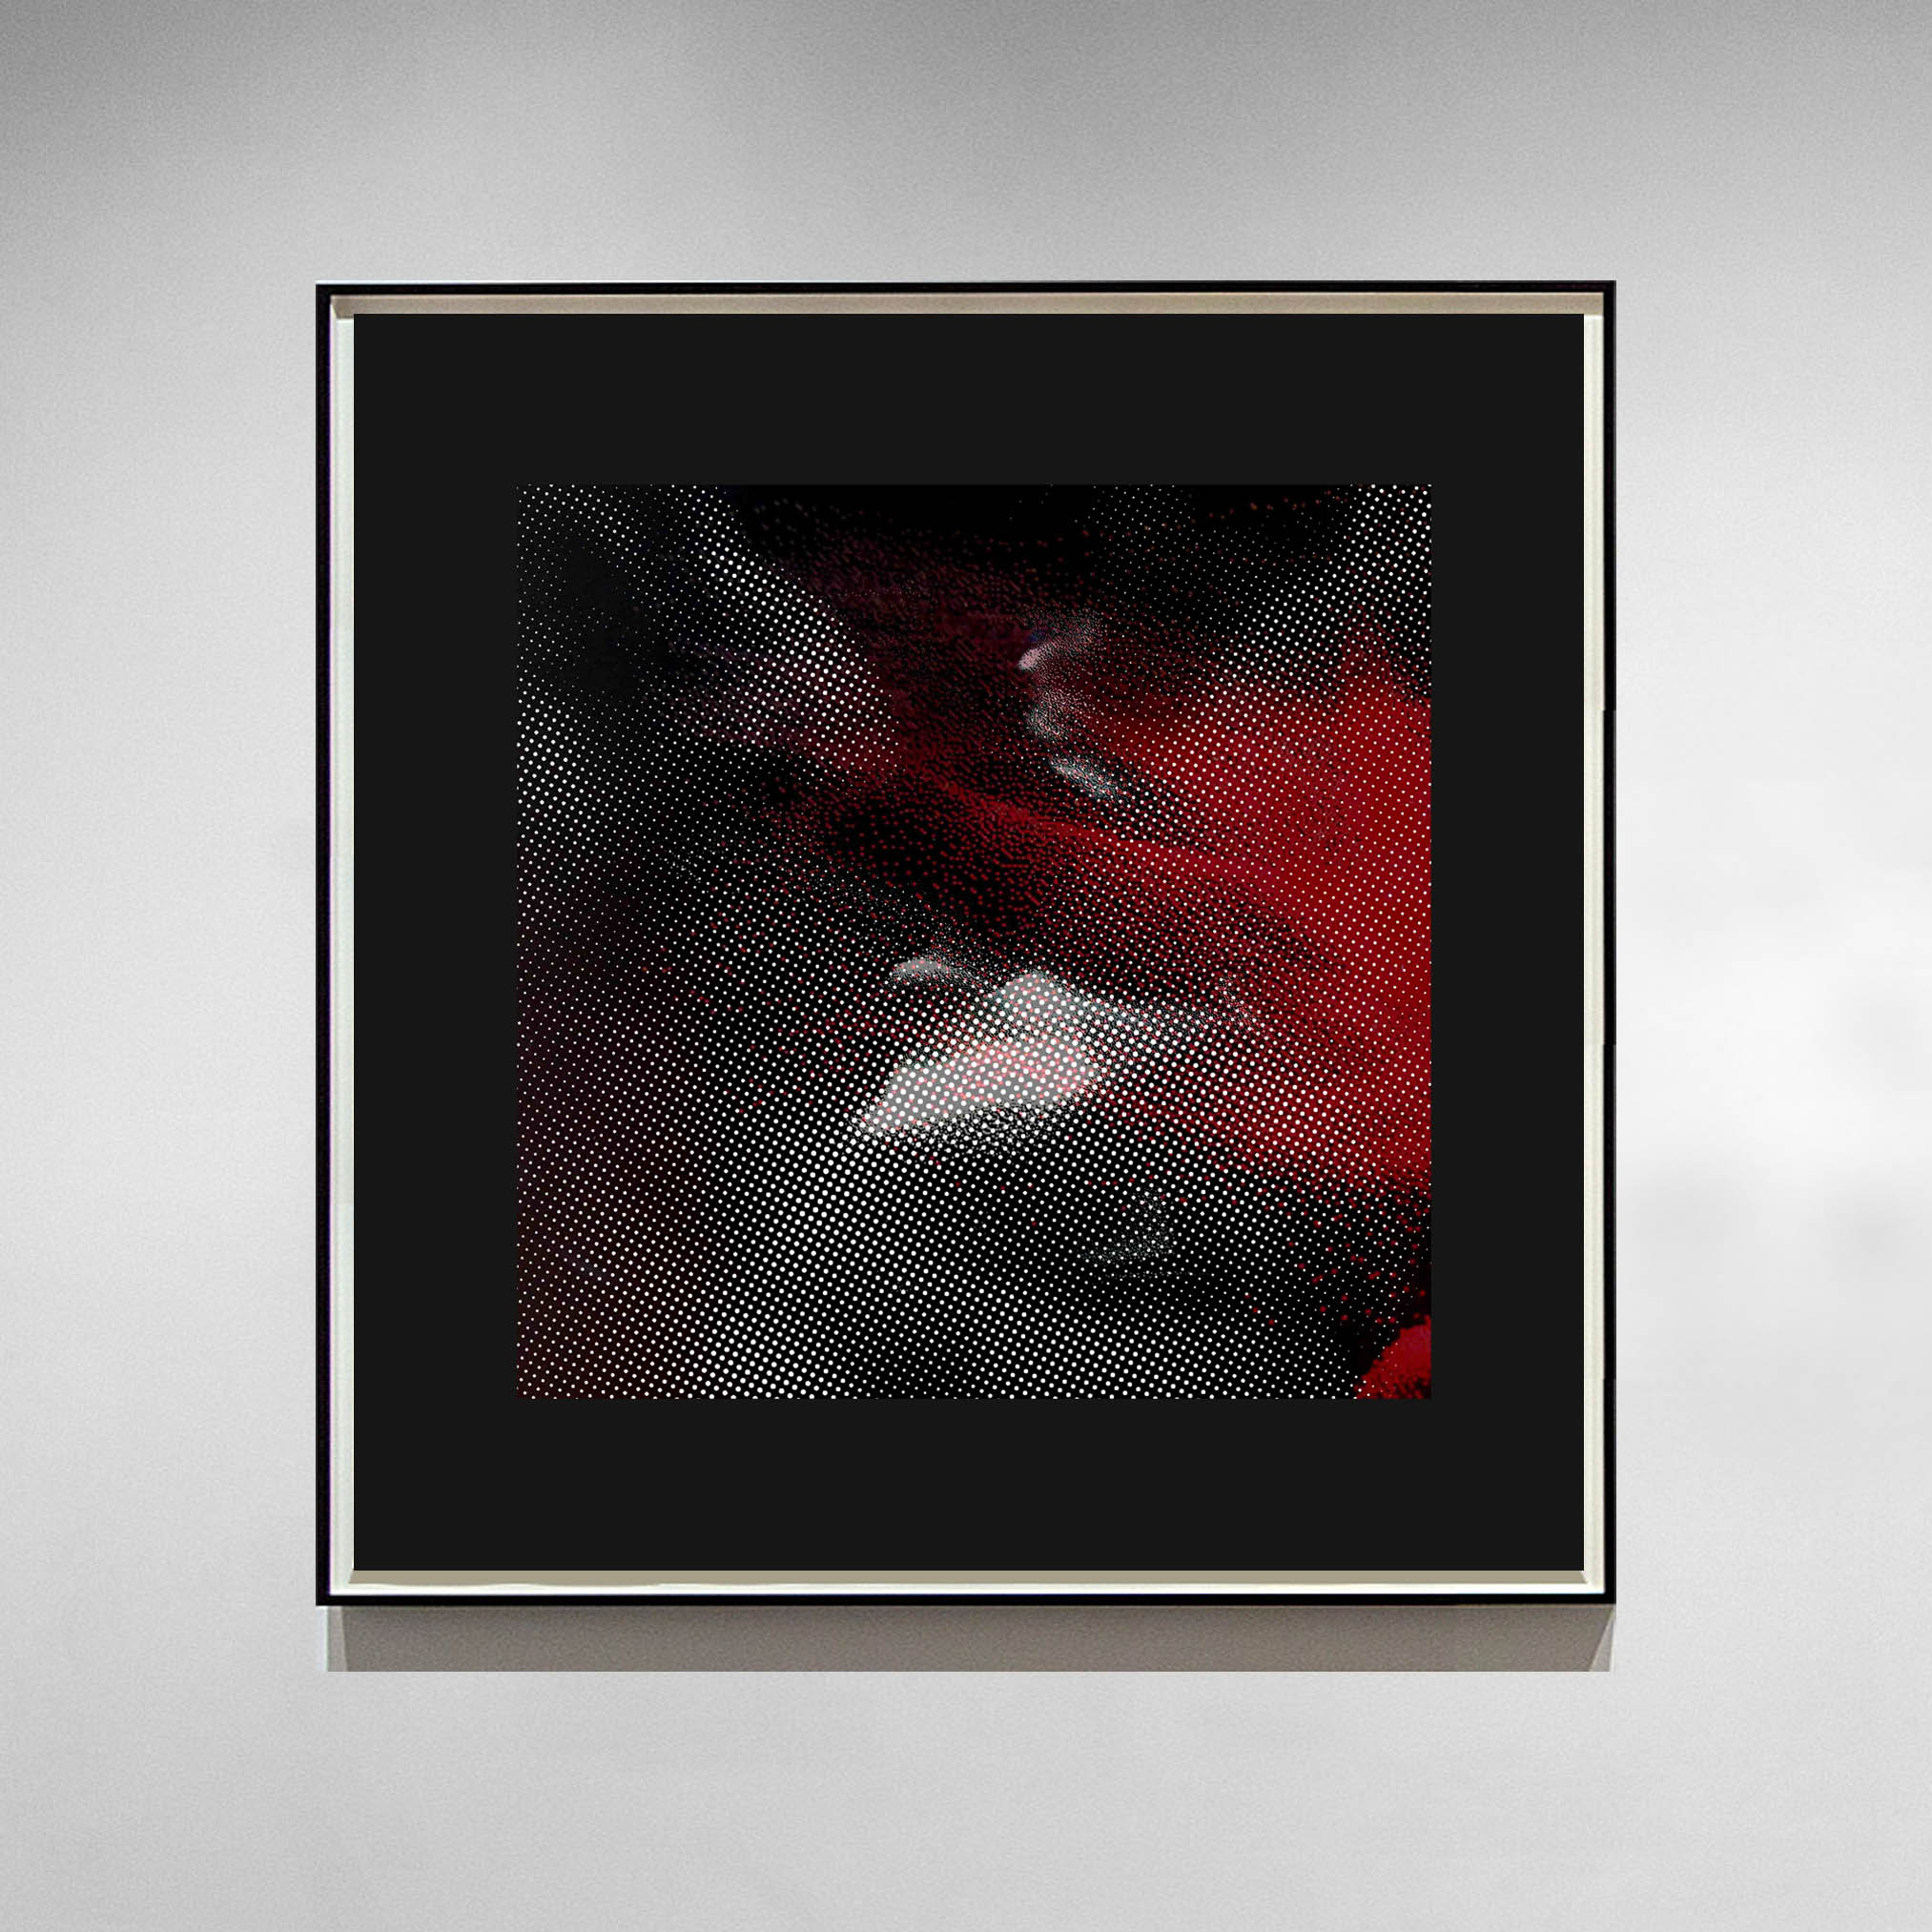 Aura III  - 2014 - Screen print on paper - 30 x 30 cm  - Edition of 01